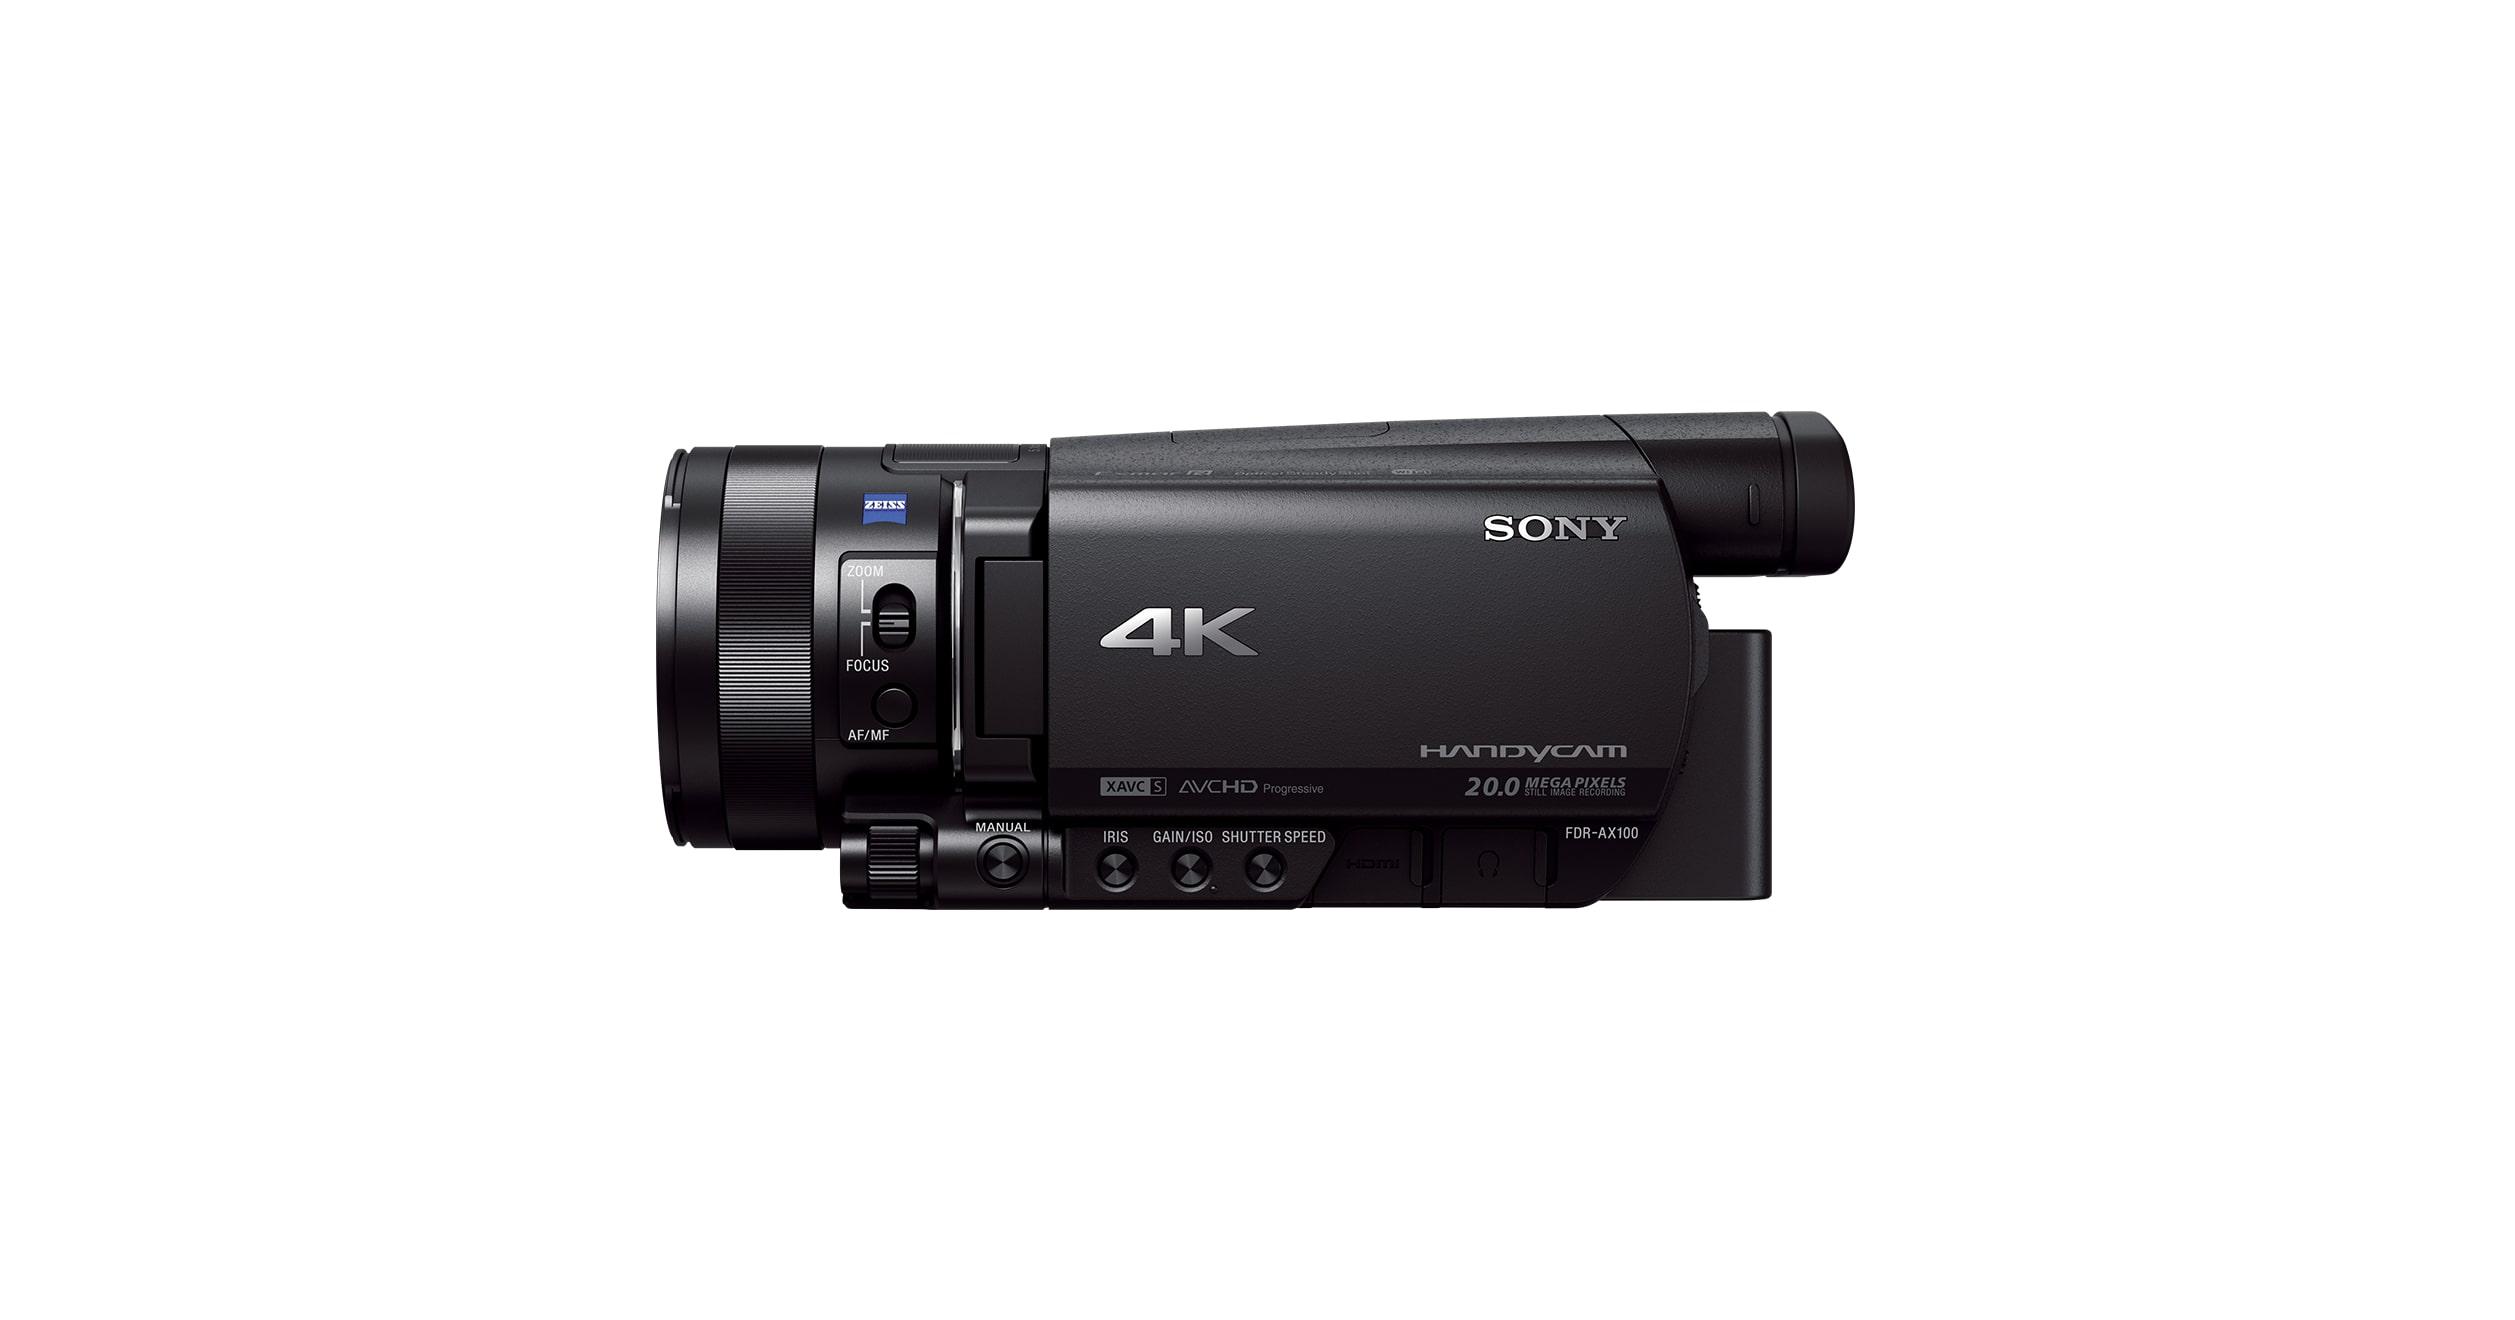 4k Camcorder Portable Video Camera Fdr Ax100e Sony In